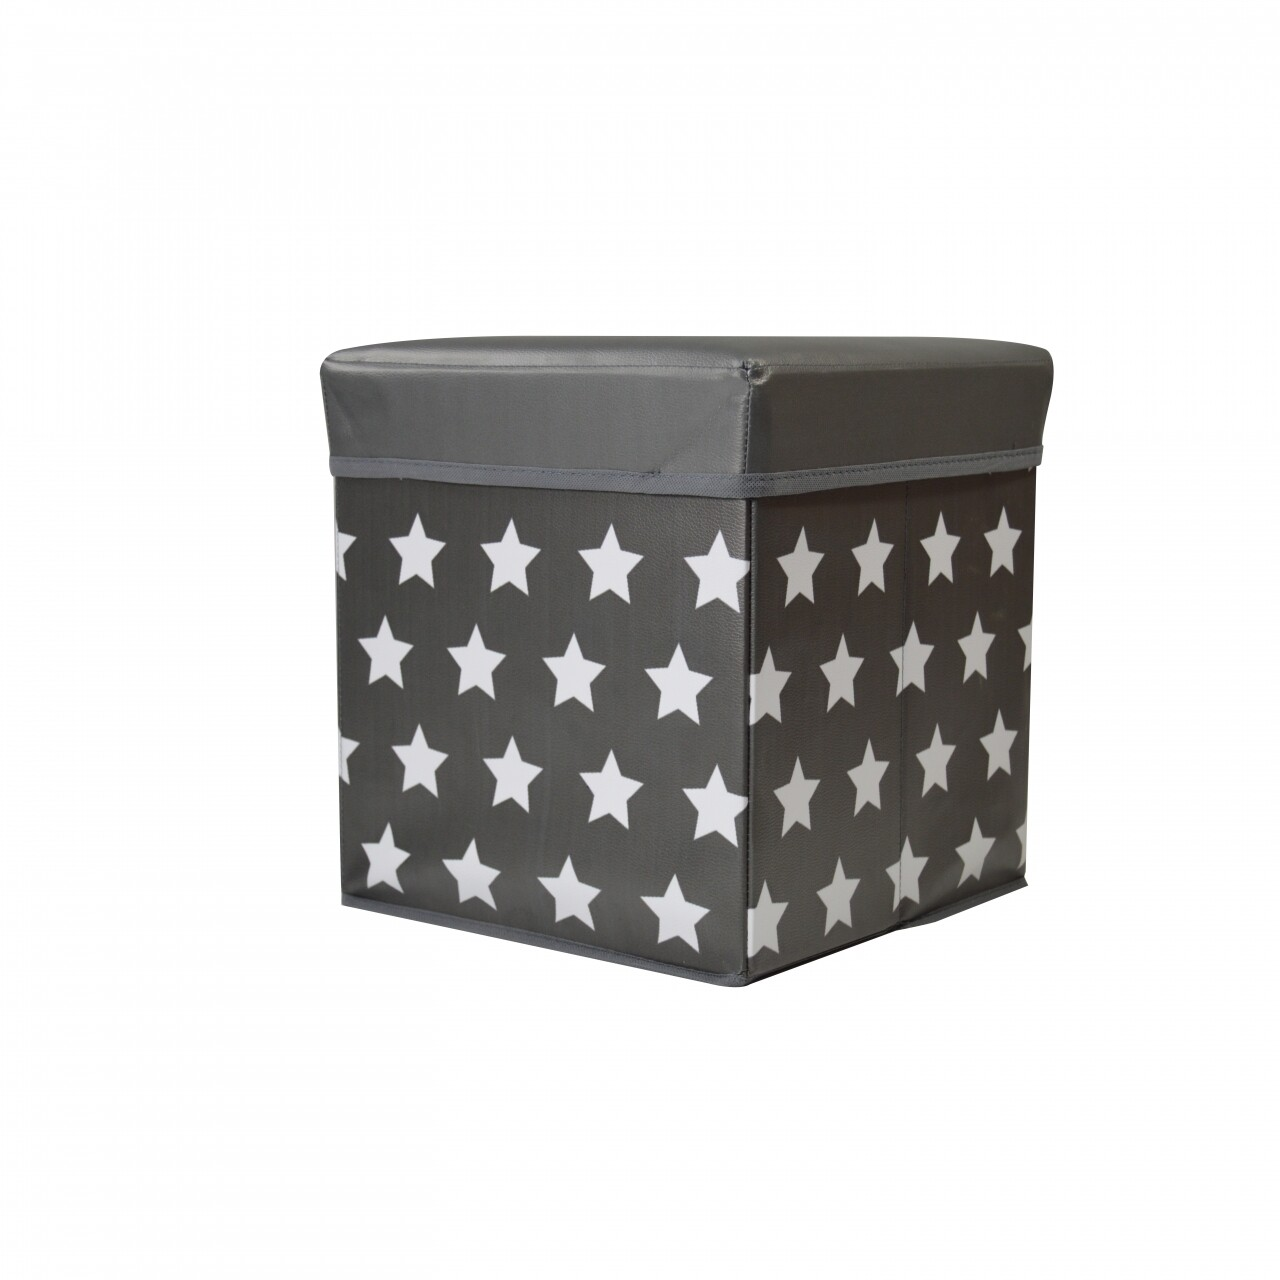 Taburet cu spațiu de depozitare Star, Jocca, 30 x 30 x 30 cm, PVC, gri/alb